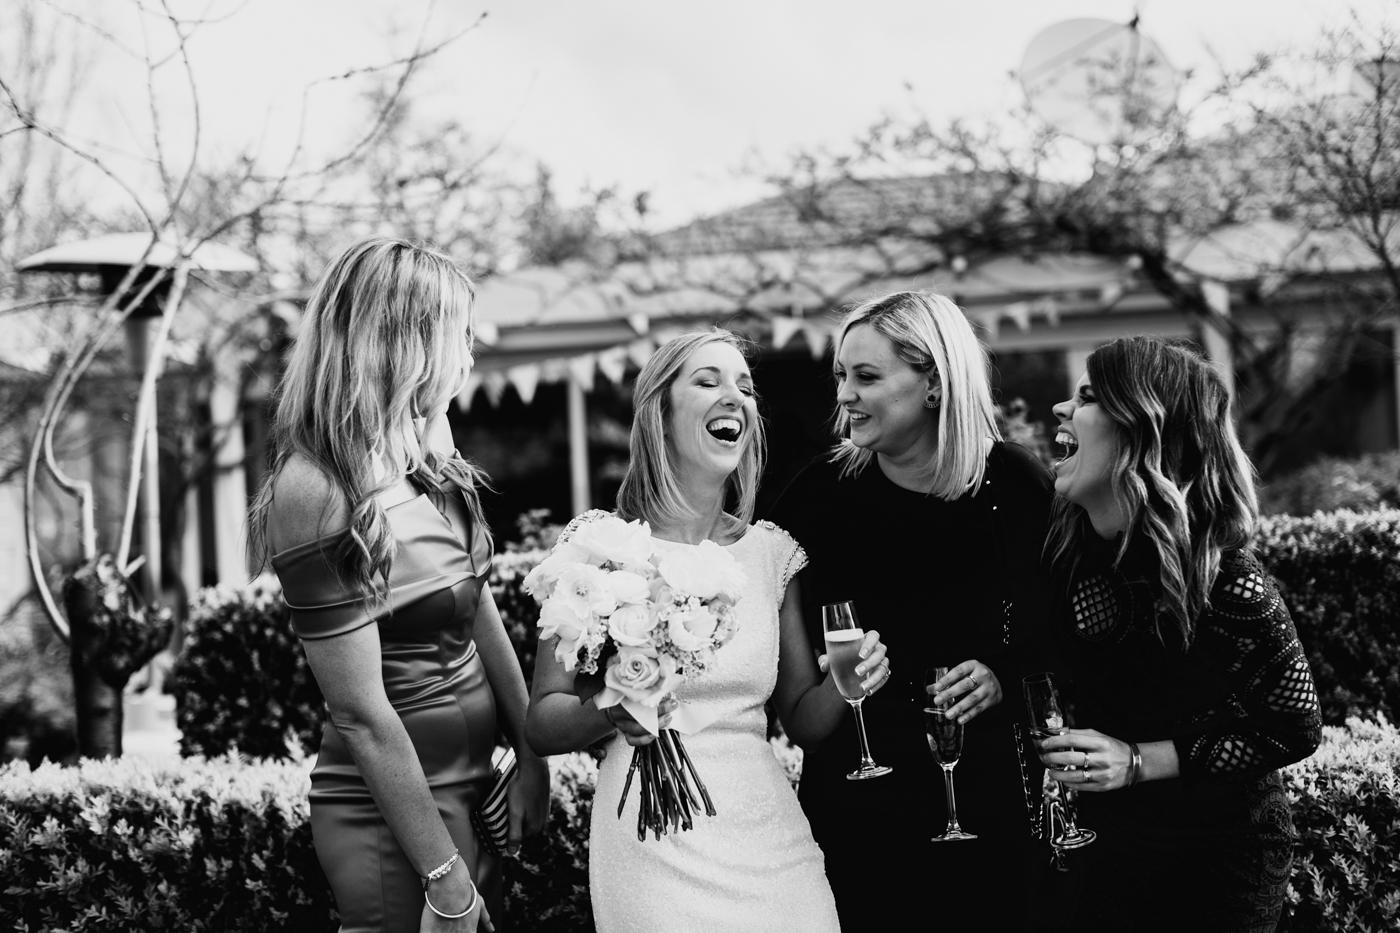 Bridget & James - Orange Country Wedding - Samantha Heather Photography-74.jpg